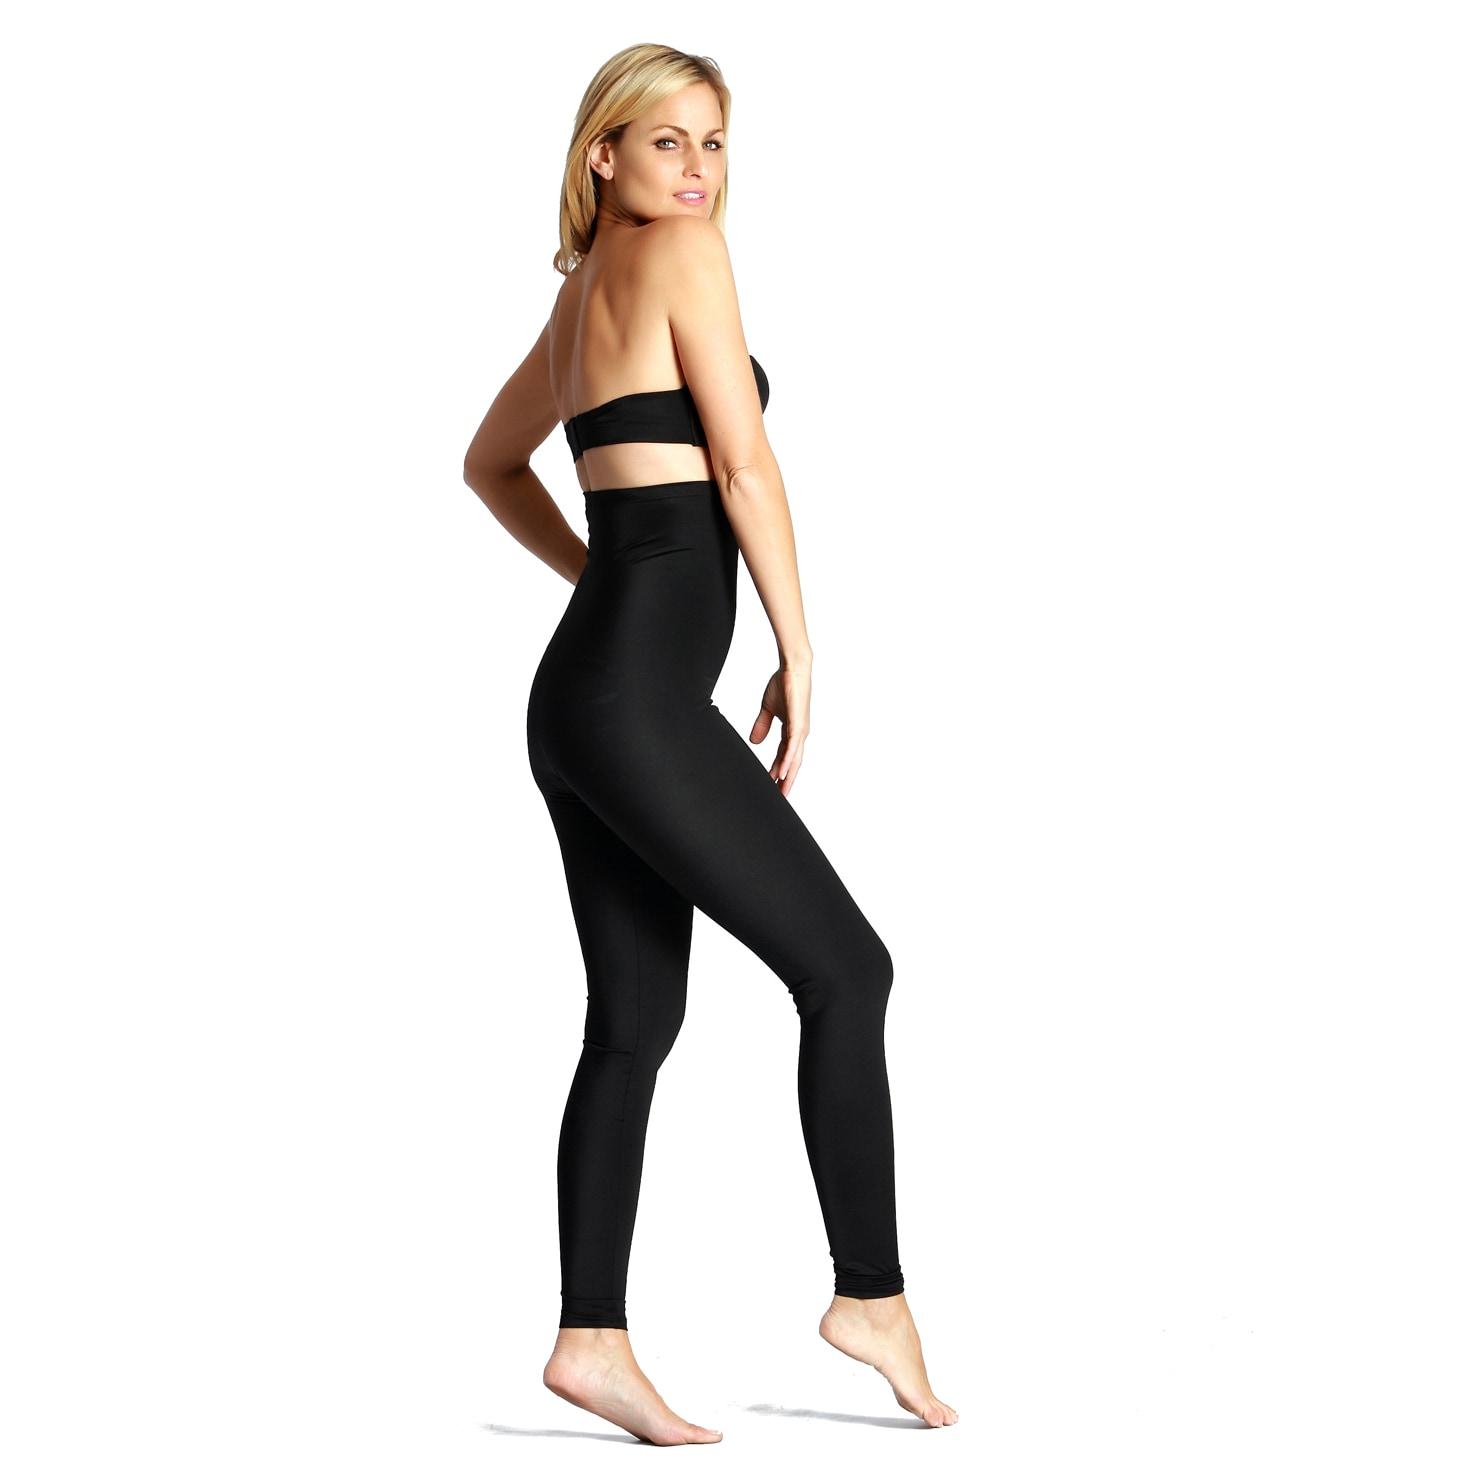 6a94935ccf479 Shop InstantFigure Women s Shapewear High-waist Pants - On Sale ...